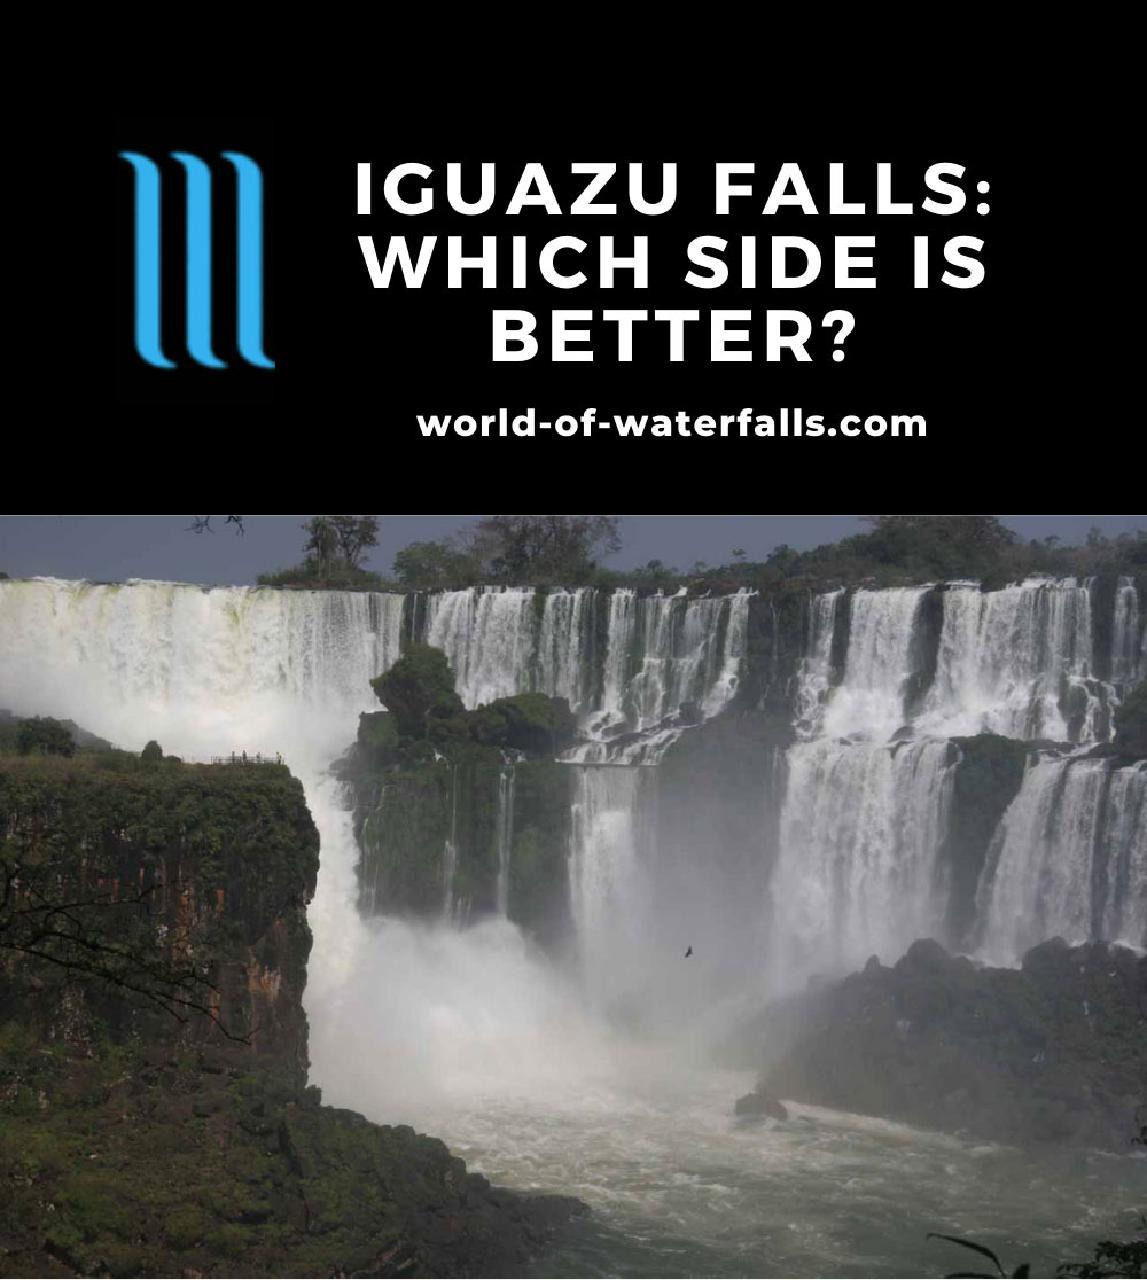 Iguazu Falls: Which Side Is Better?